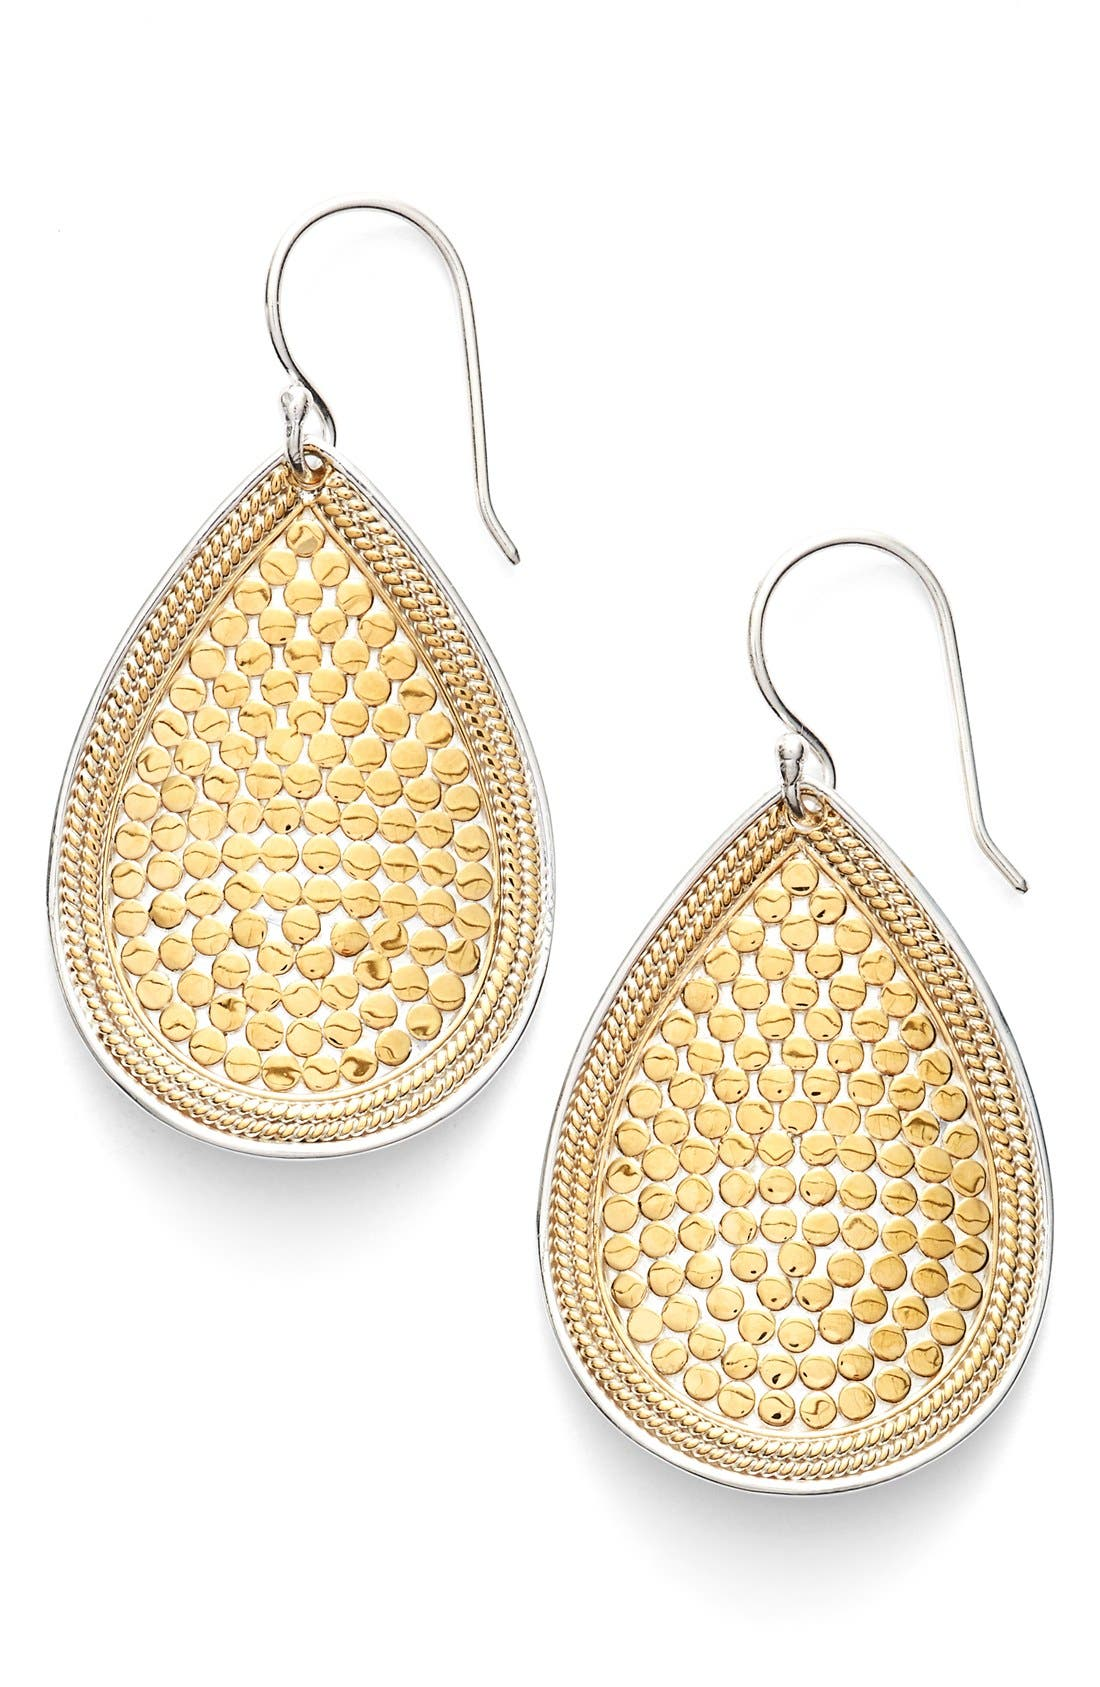 Gili Teardrop Earrings,                         Main,                         color, Gold/ Silver